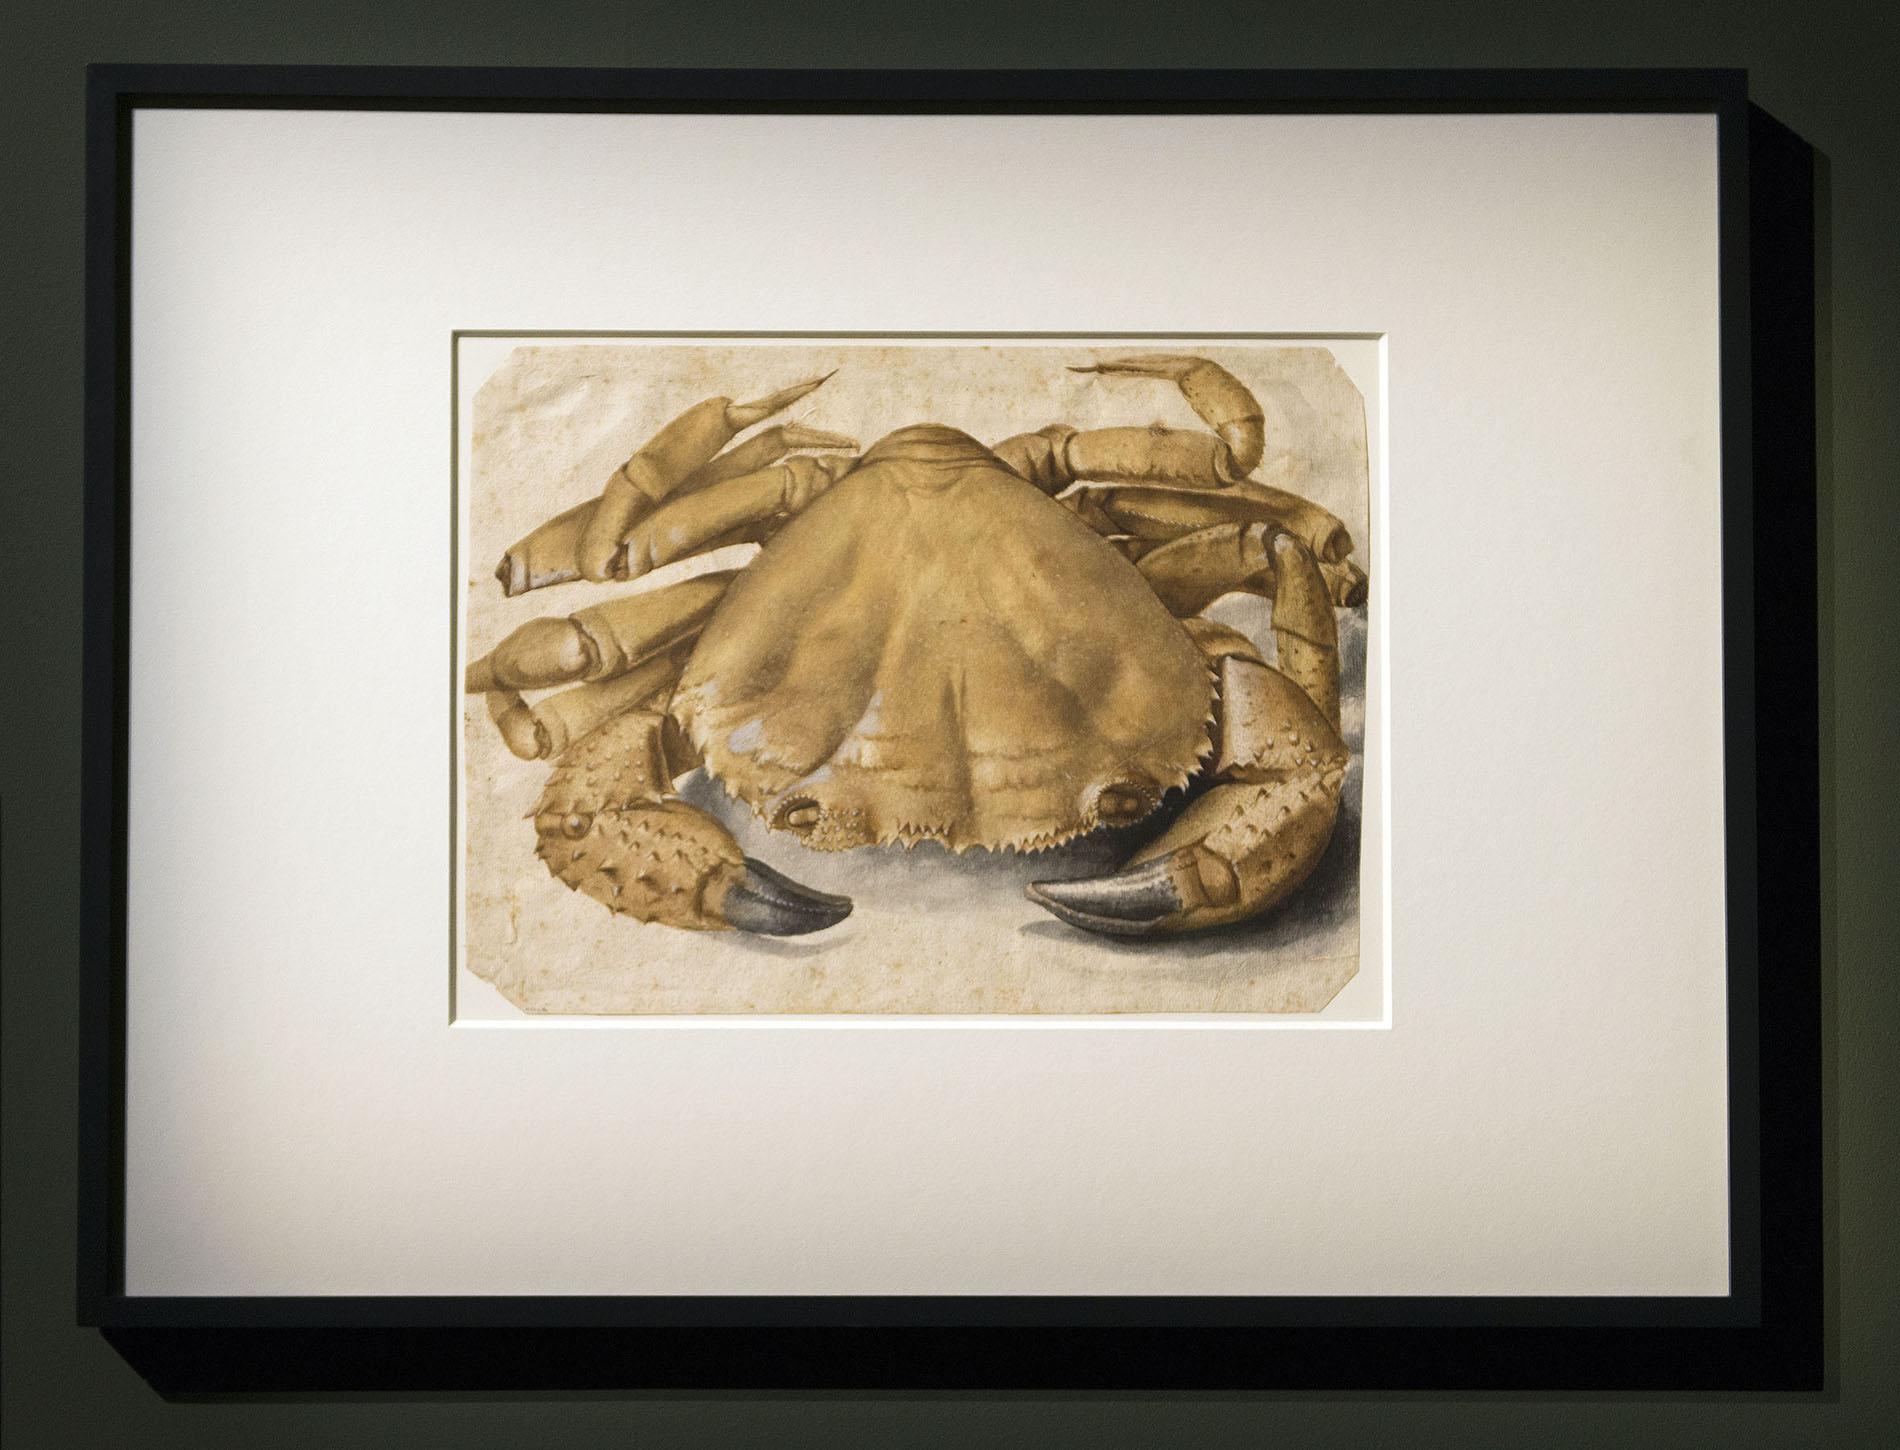 Ausstellungsansicht Palazzo Reale Milano, Albert Dürer, Krebs, 1495, Aquarell auf Papier © Foto: Paolo Poce